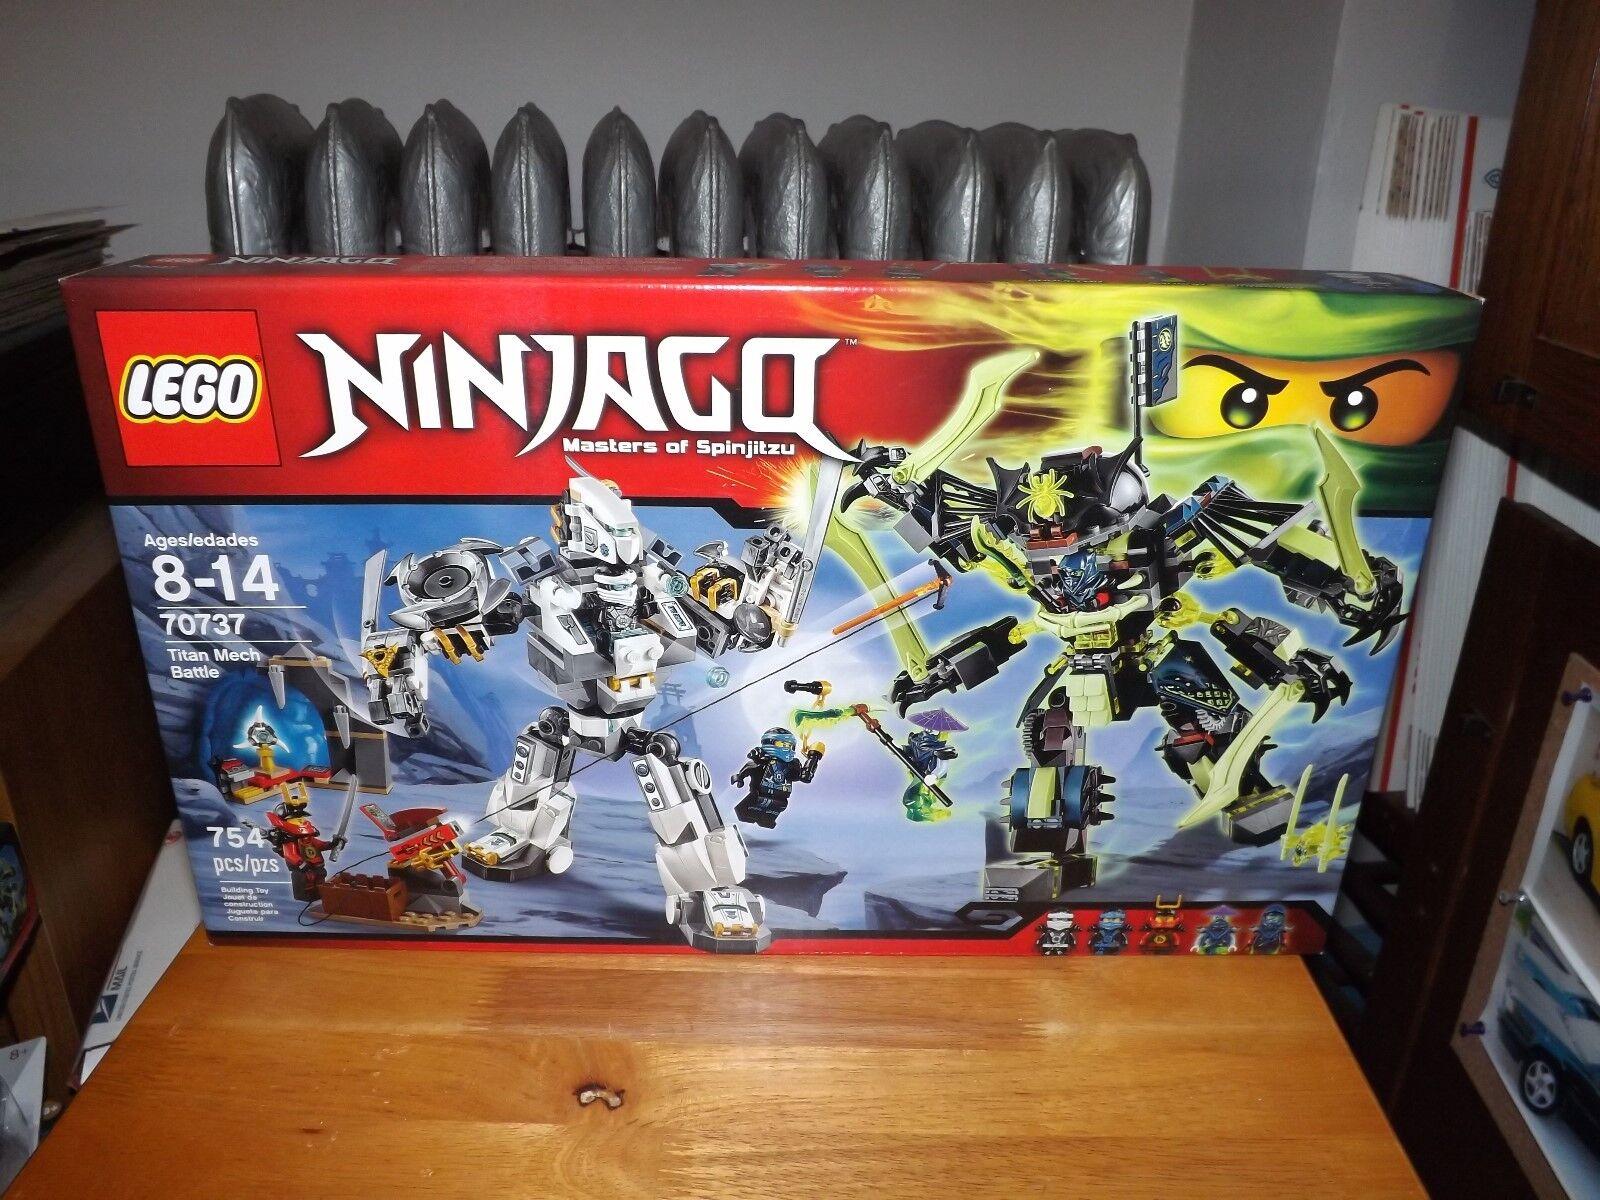 LEGO, NINJAGO, TITAN MECH BATTLE, KIT PIECES, NIB, 2015